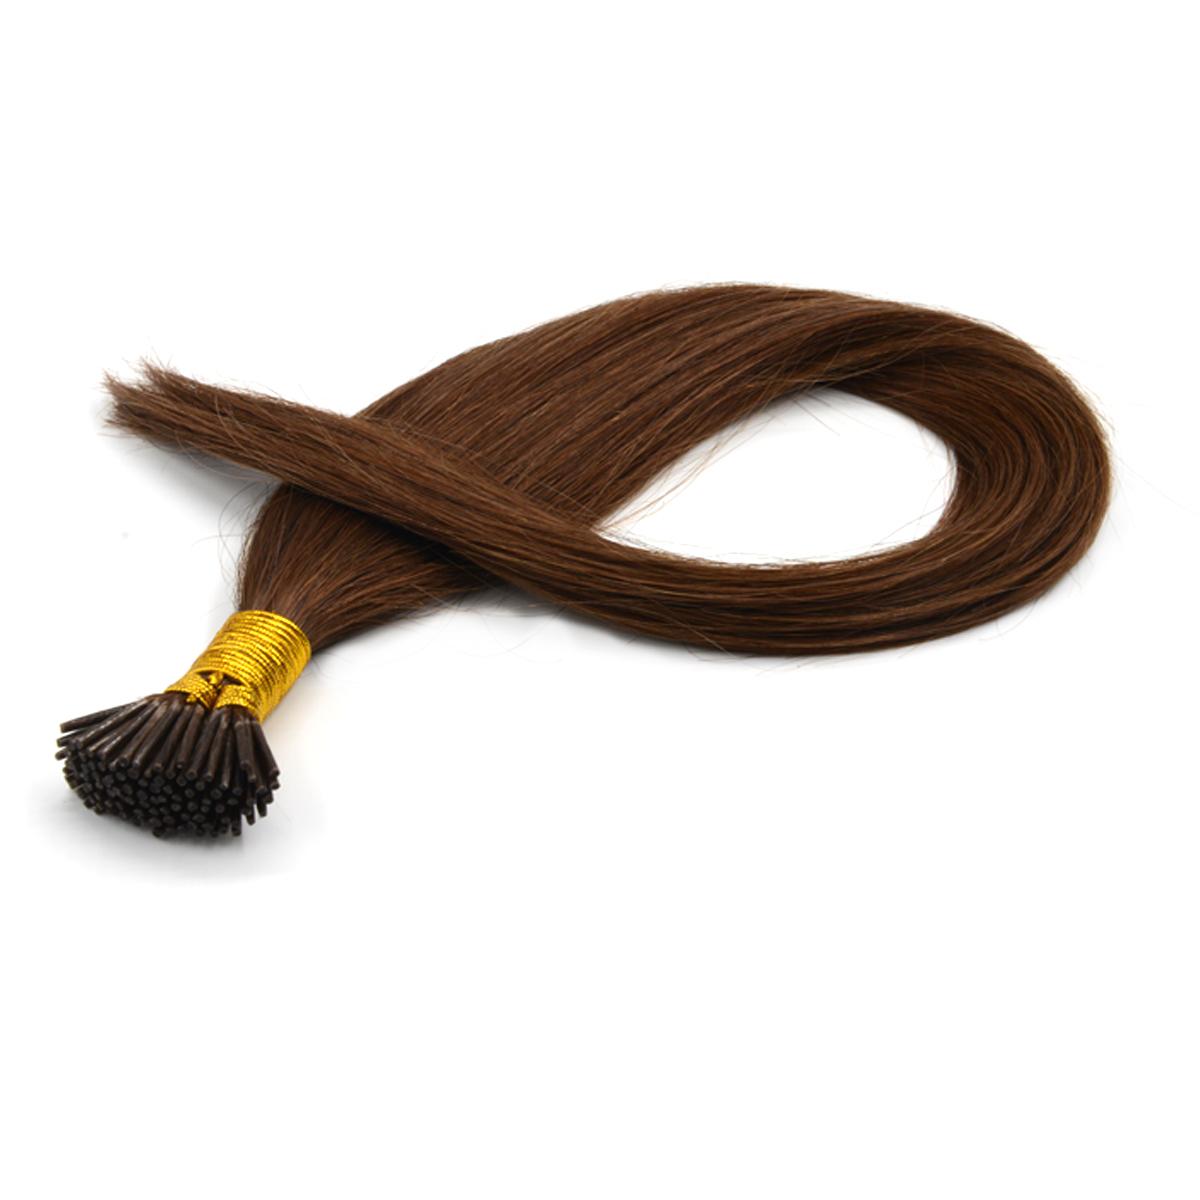 Virgin Brazilian Hair Straight #6 I Tip Hair Extensions